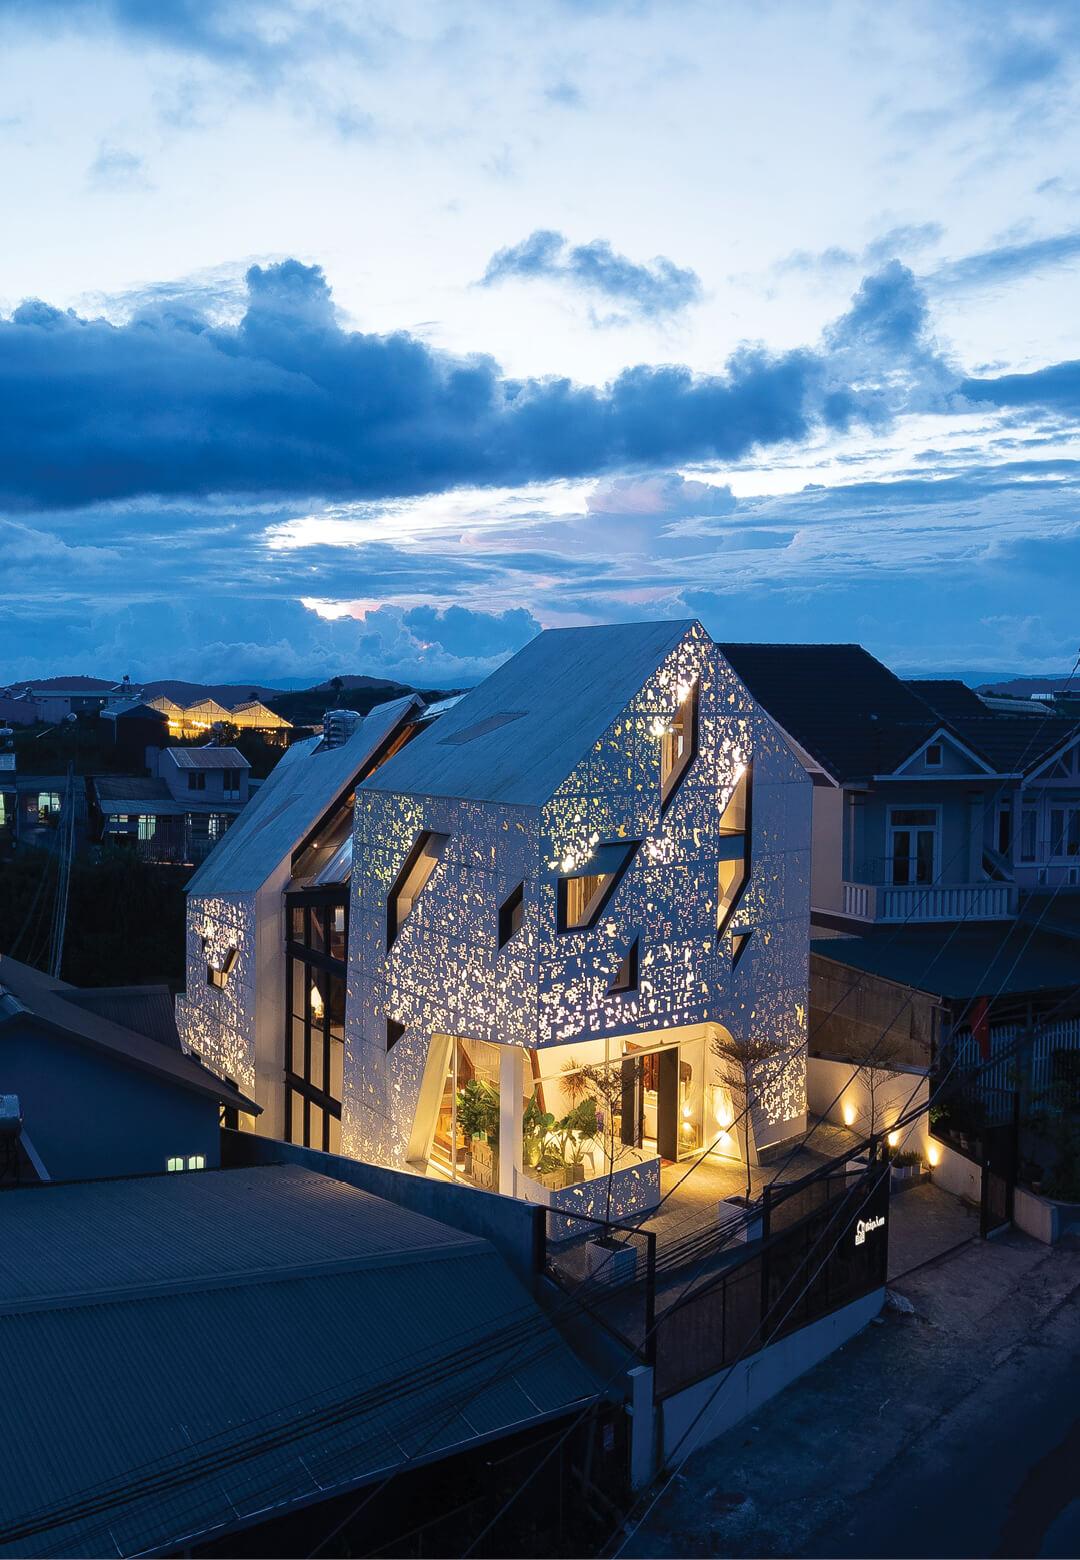 The Nap Am Homestay illuminates its surroundings like a screened lantern   Nap Am Homestay  Le House   STIRworld